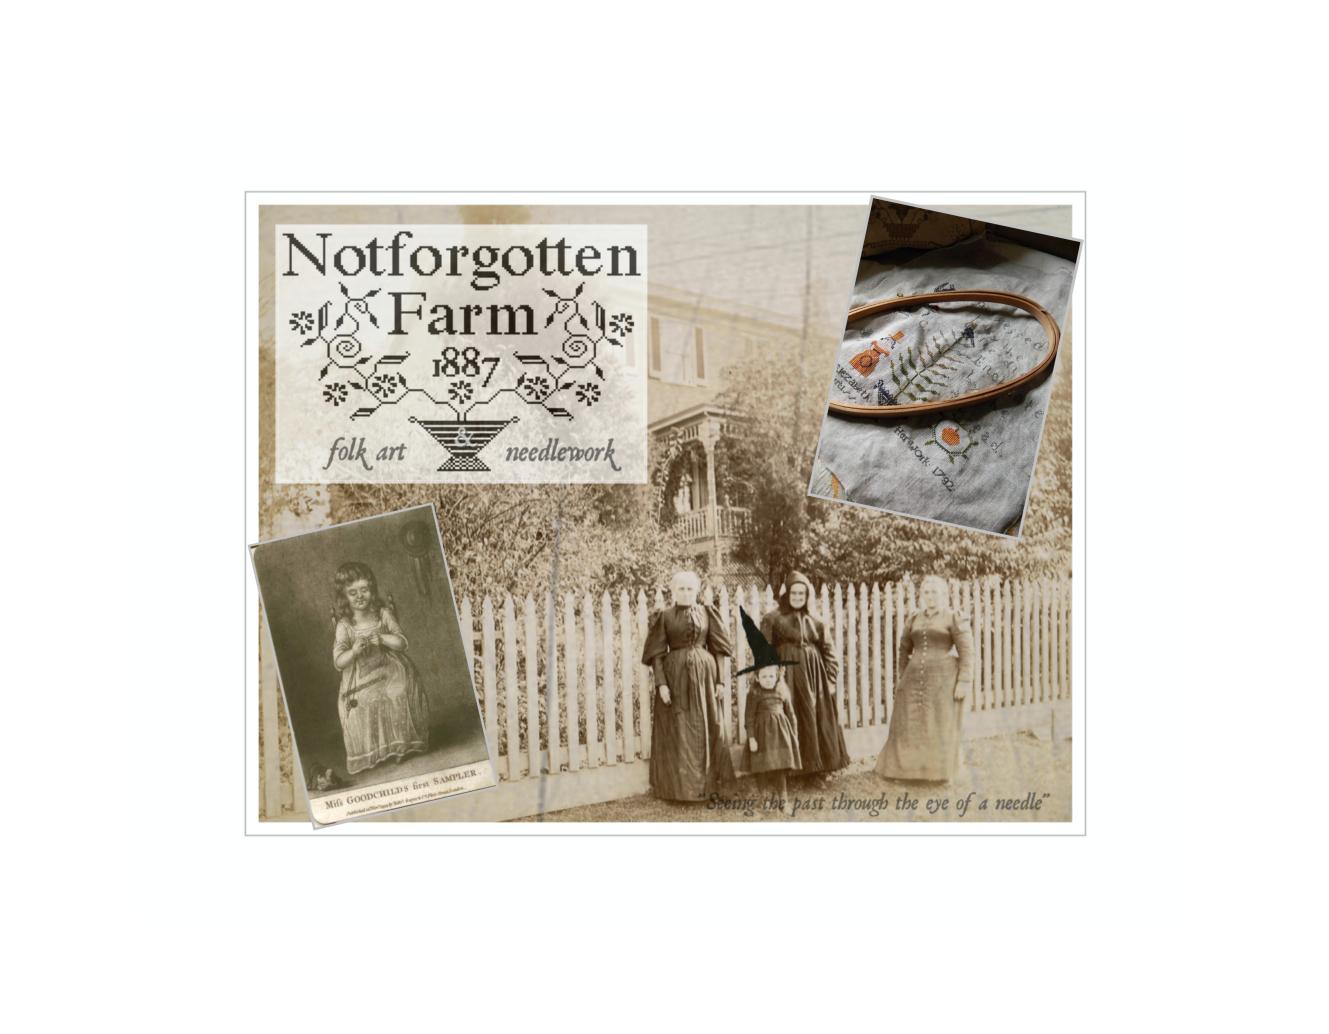 Notforgotten Farm